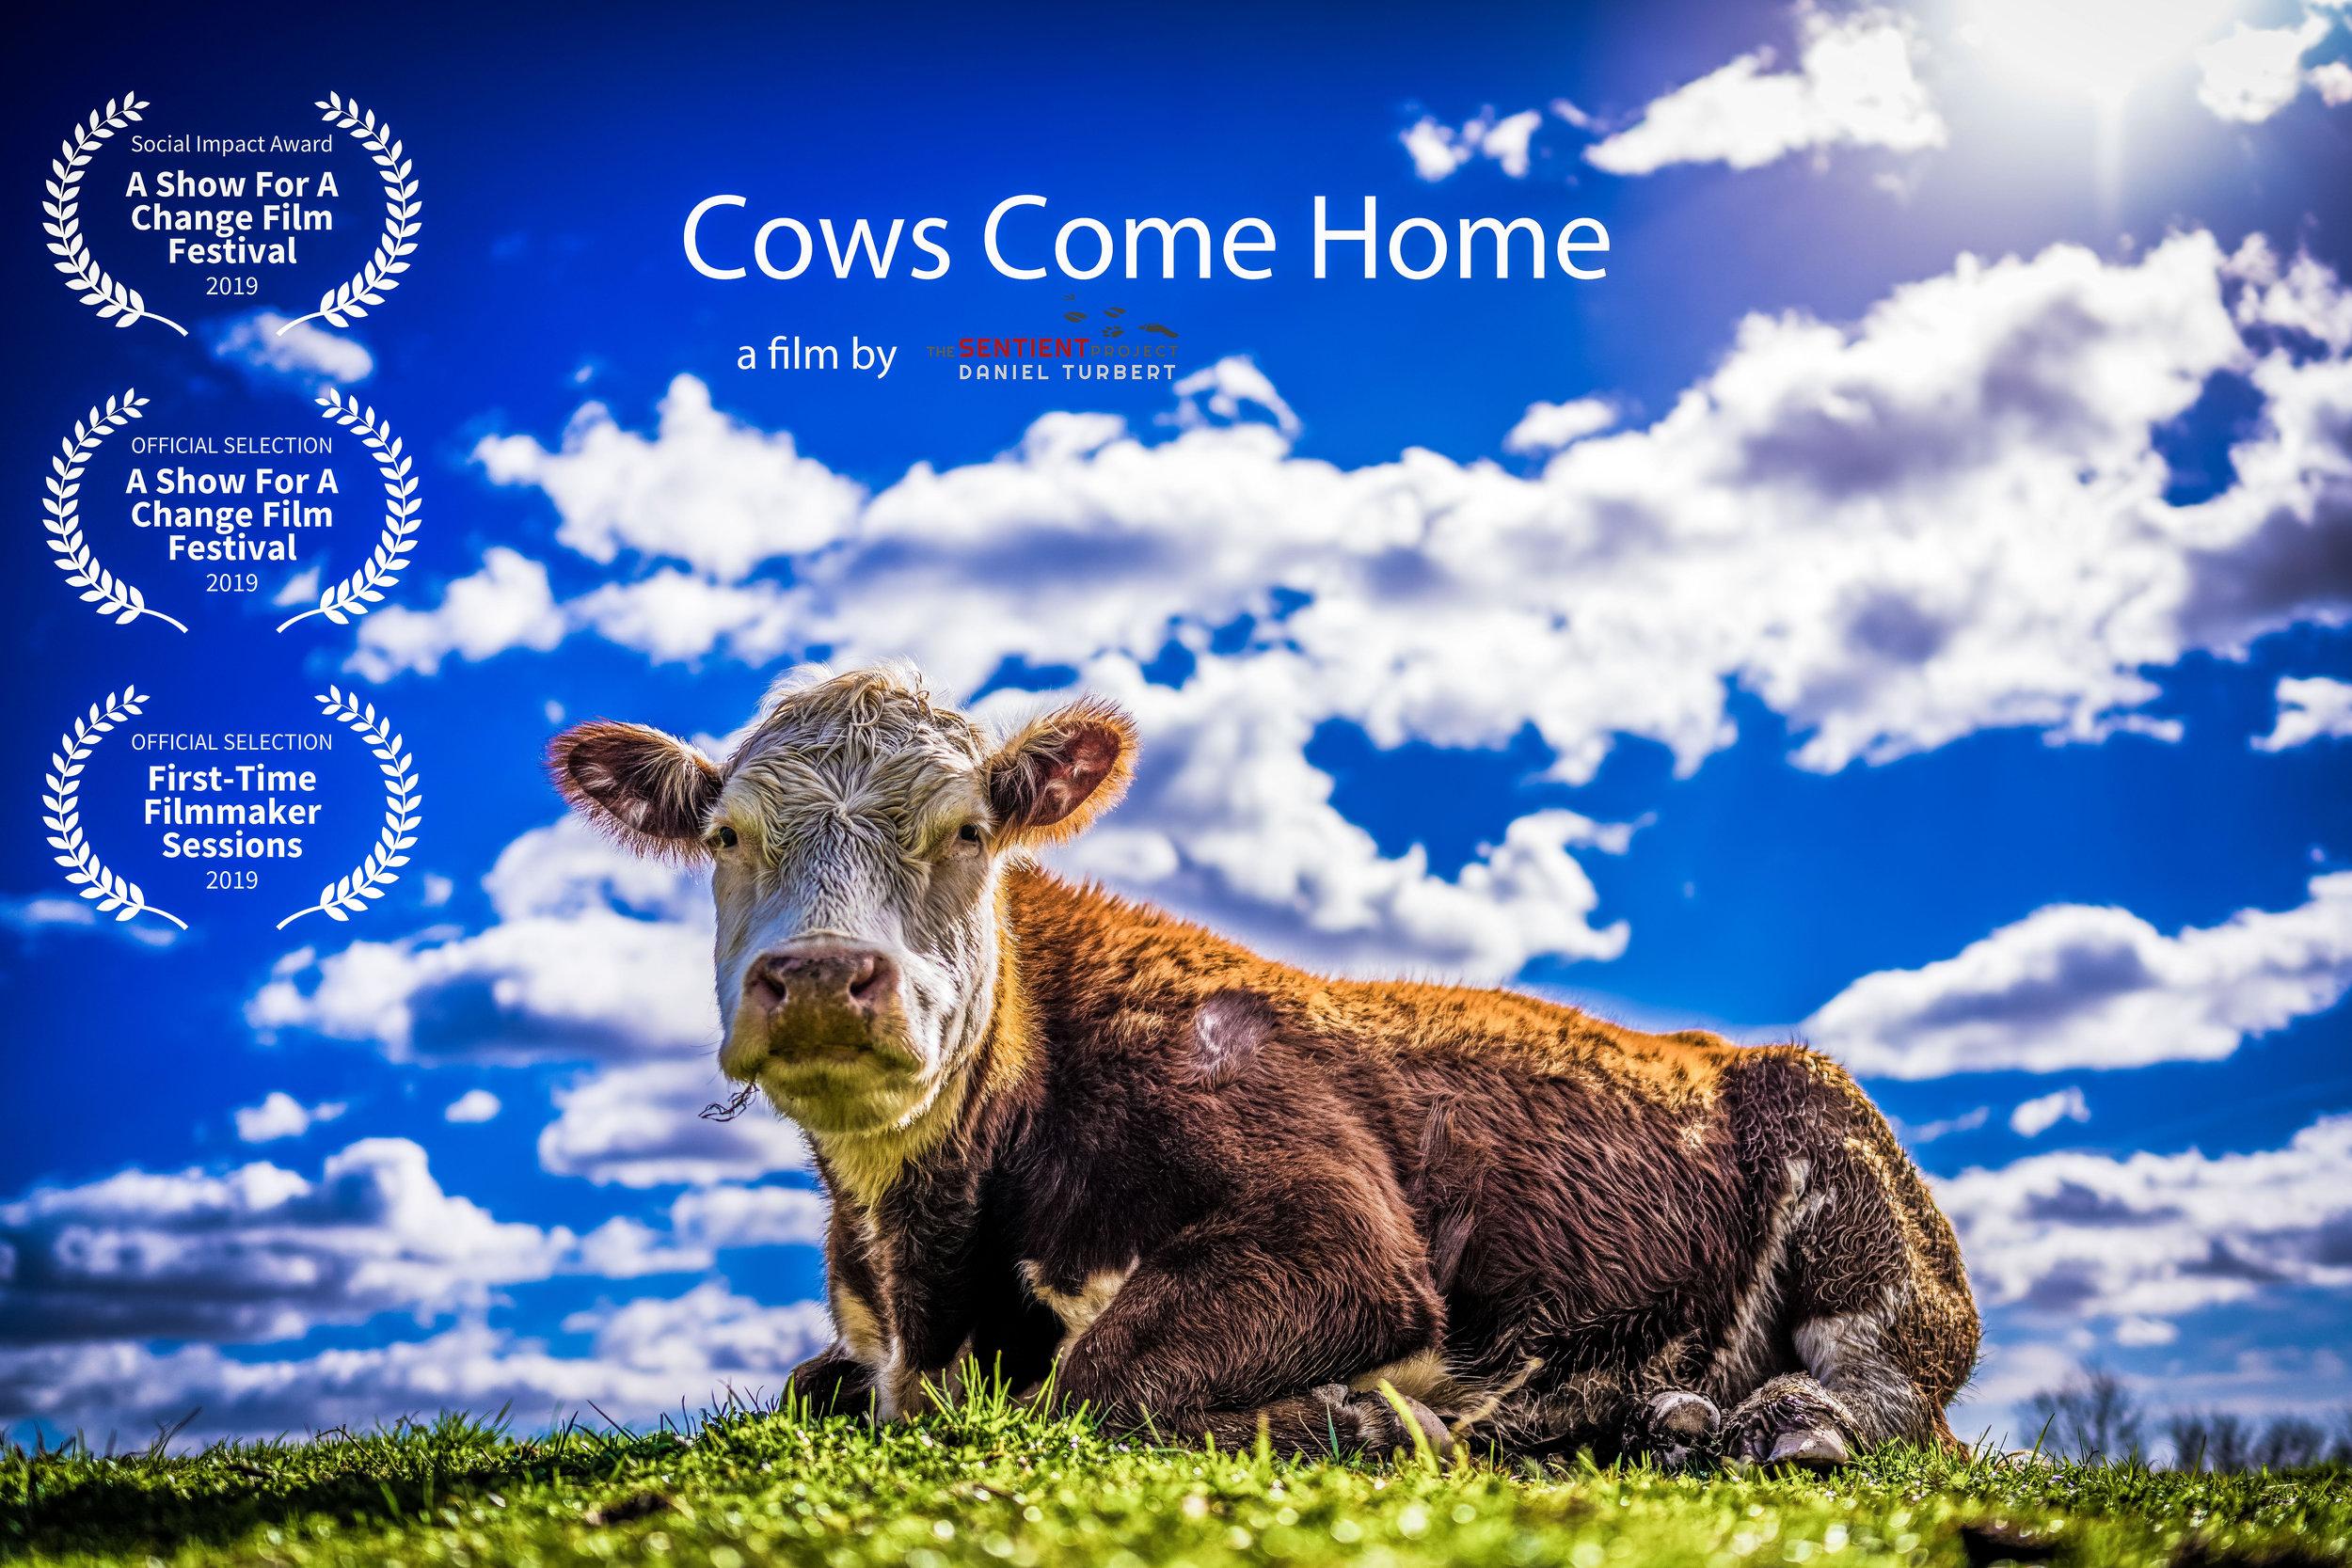 CowsComeHomePoster.jpg